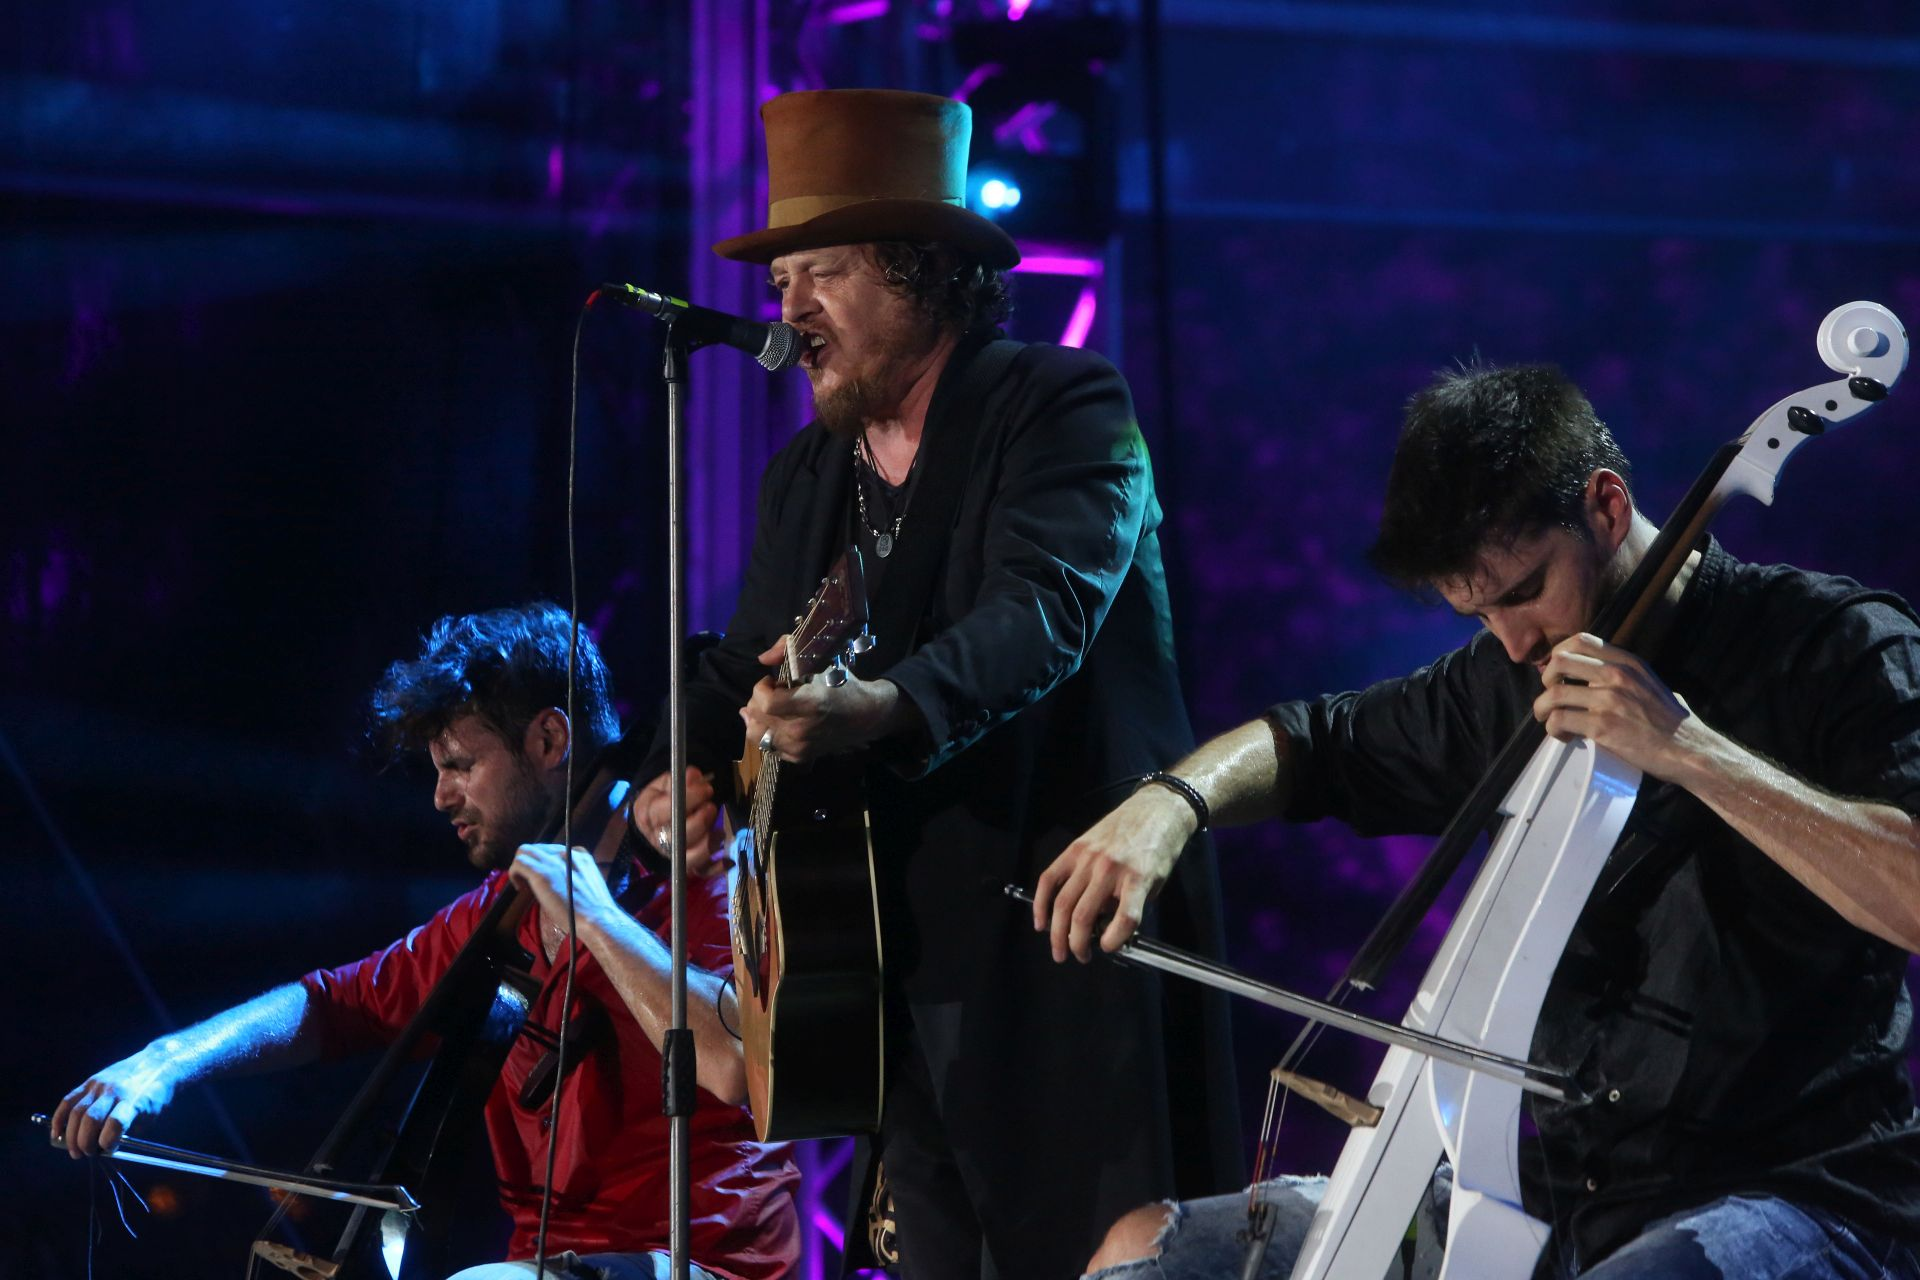 GRAĐANI ODUŠEVLJENI: Besplatni koncert 2Cellos na zagrebačkom Trgu kralja Tomislava